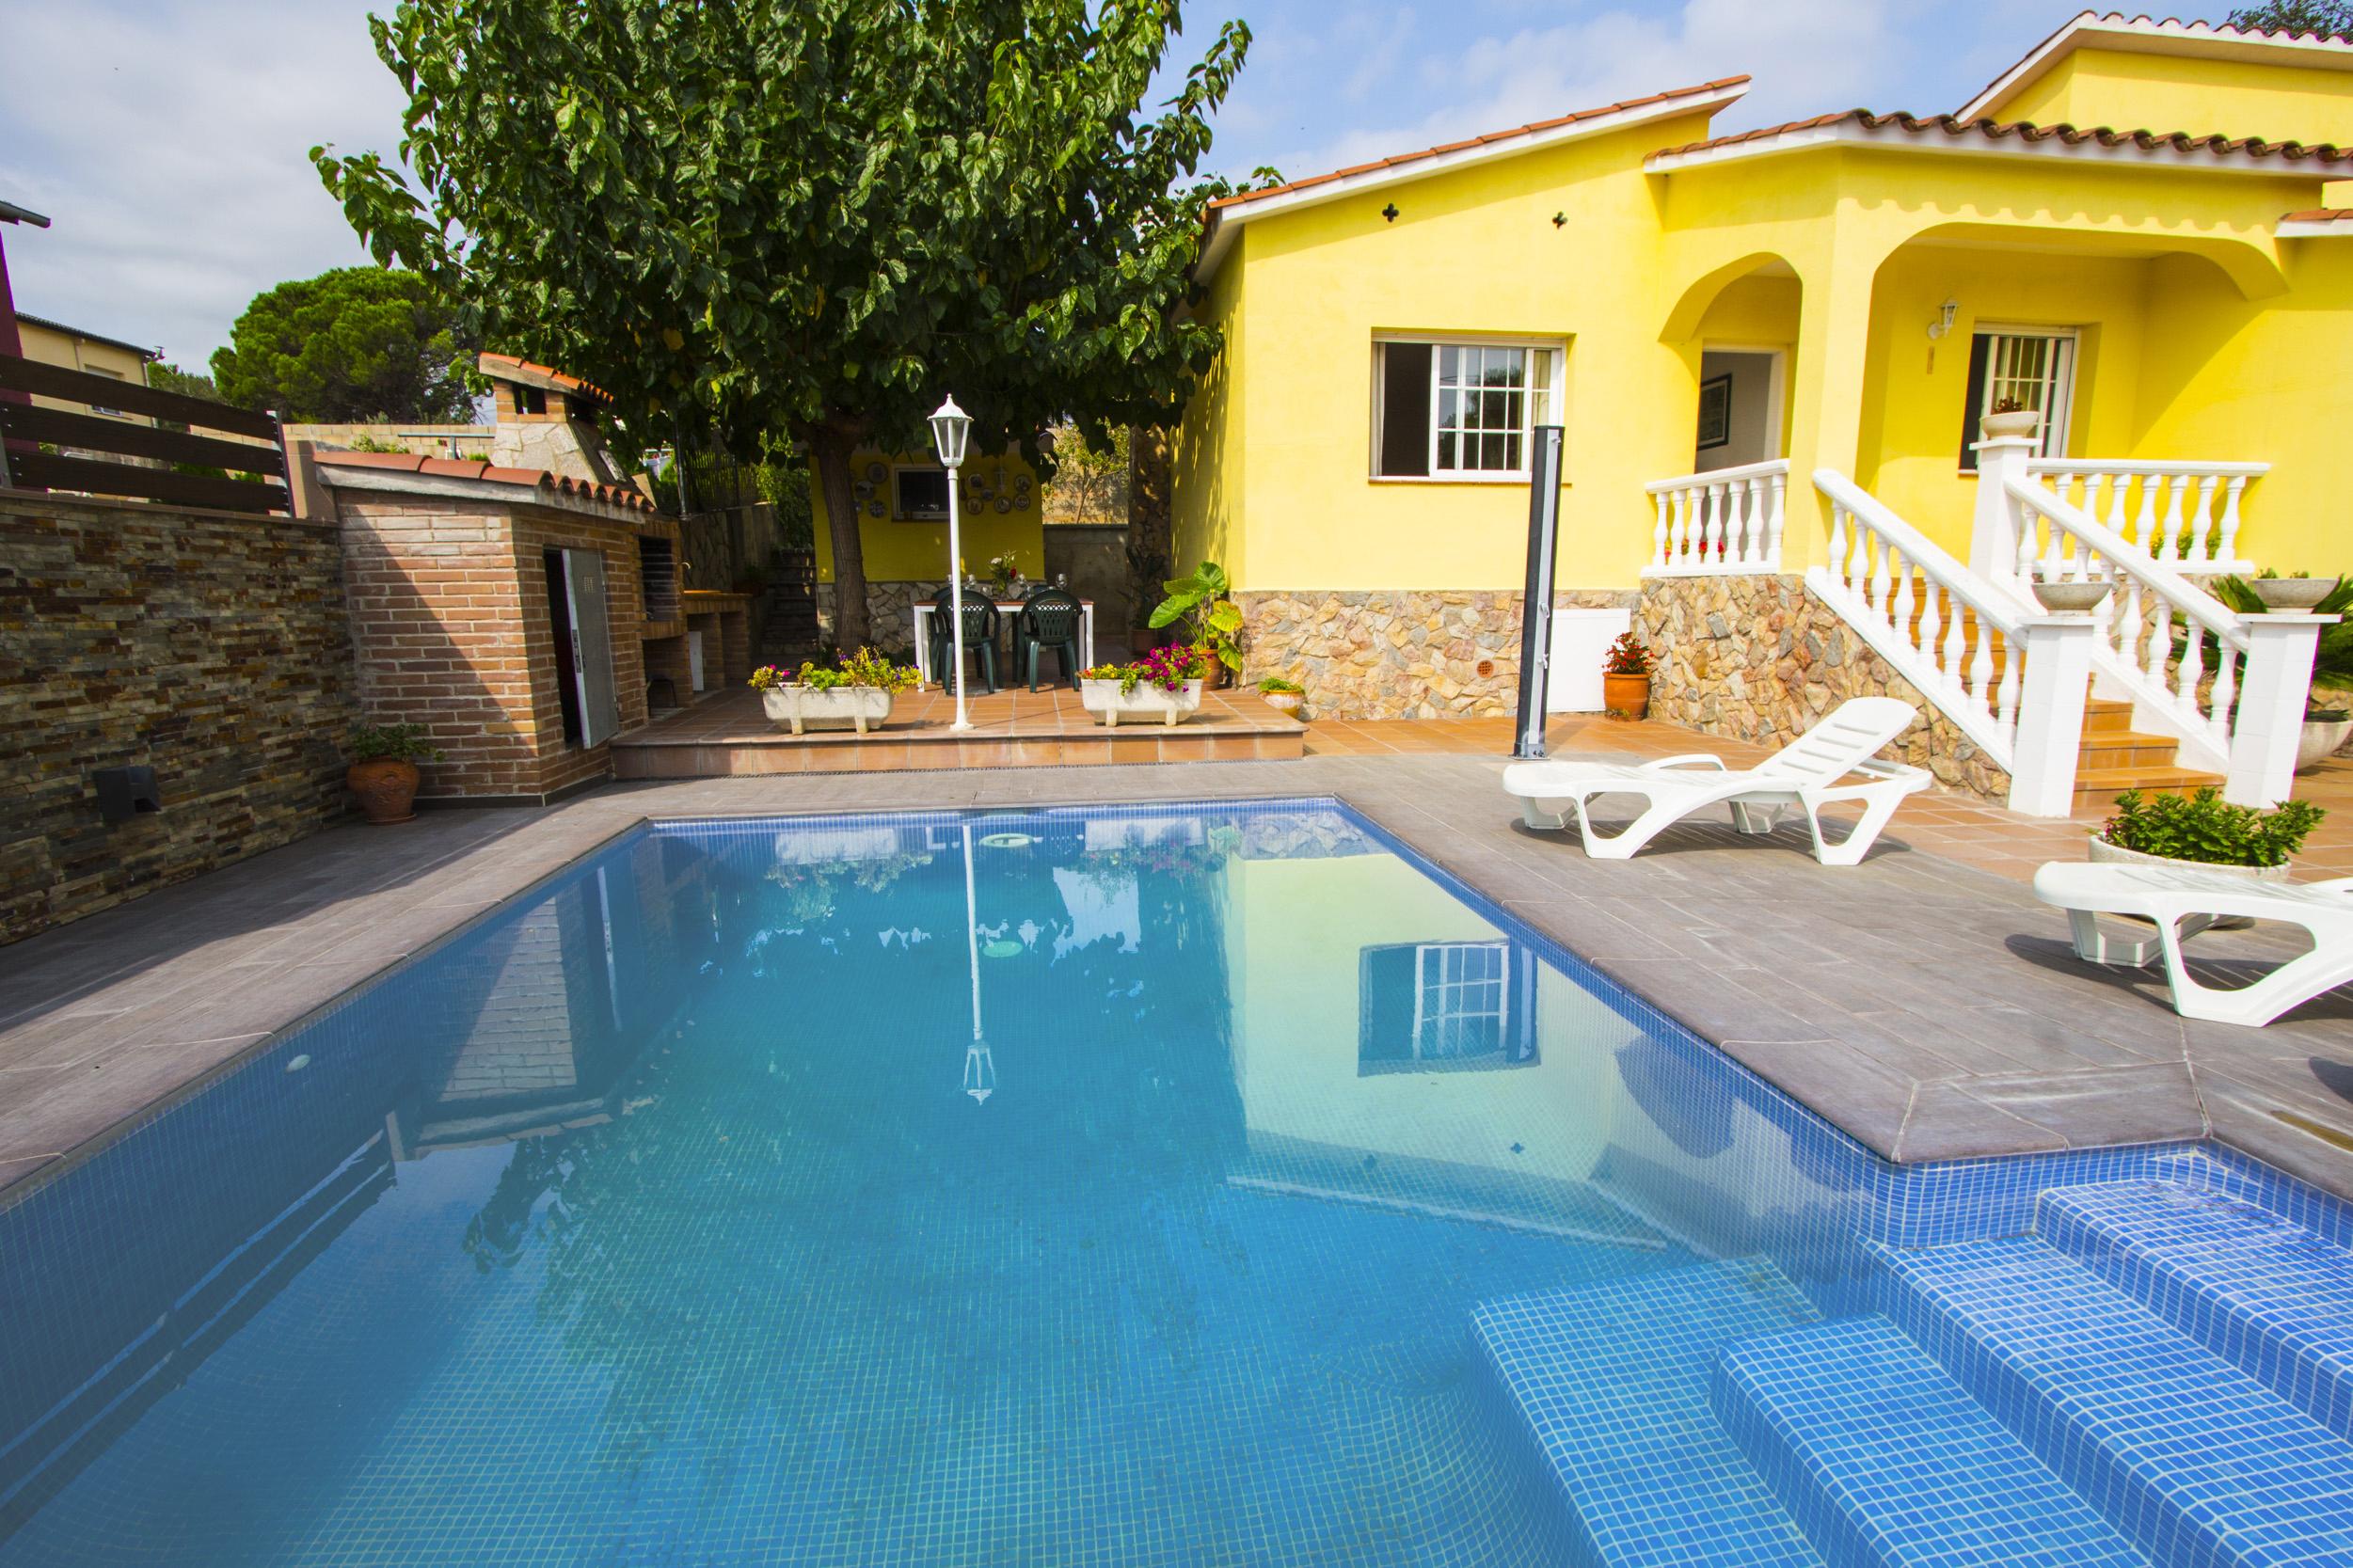 Ferienhaus Catalunya Casas: Peaceful Villa Sils, just 20 km from Costa Brava beaches! (2302155), Les Mallorquines, Girona, Katalonien, Spanien, Bild 2